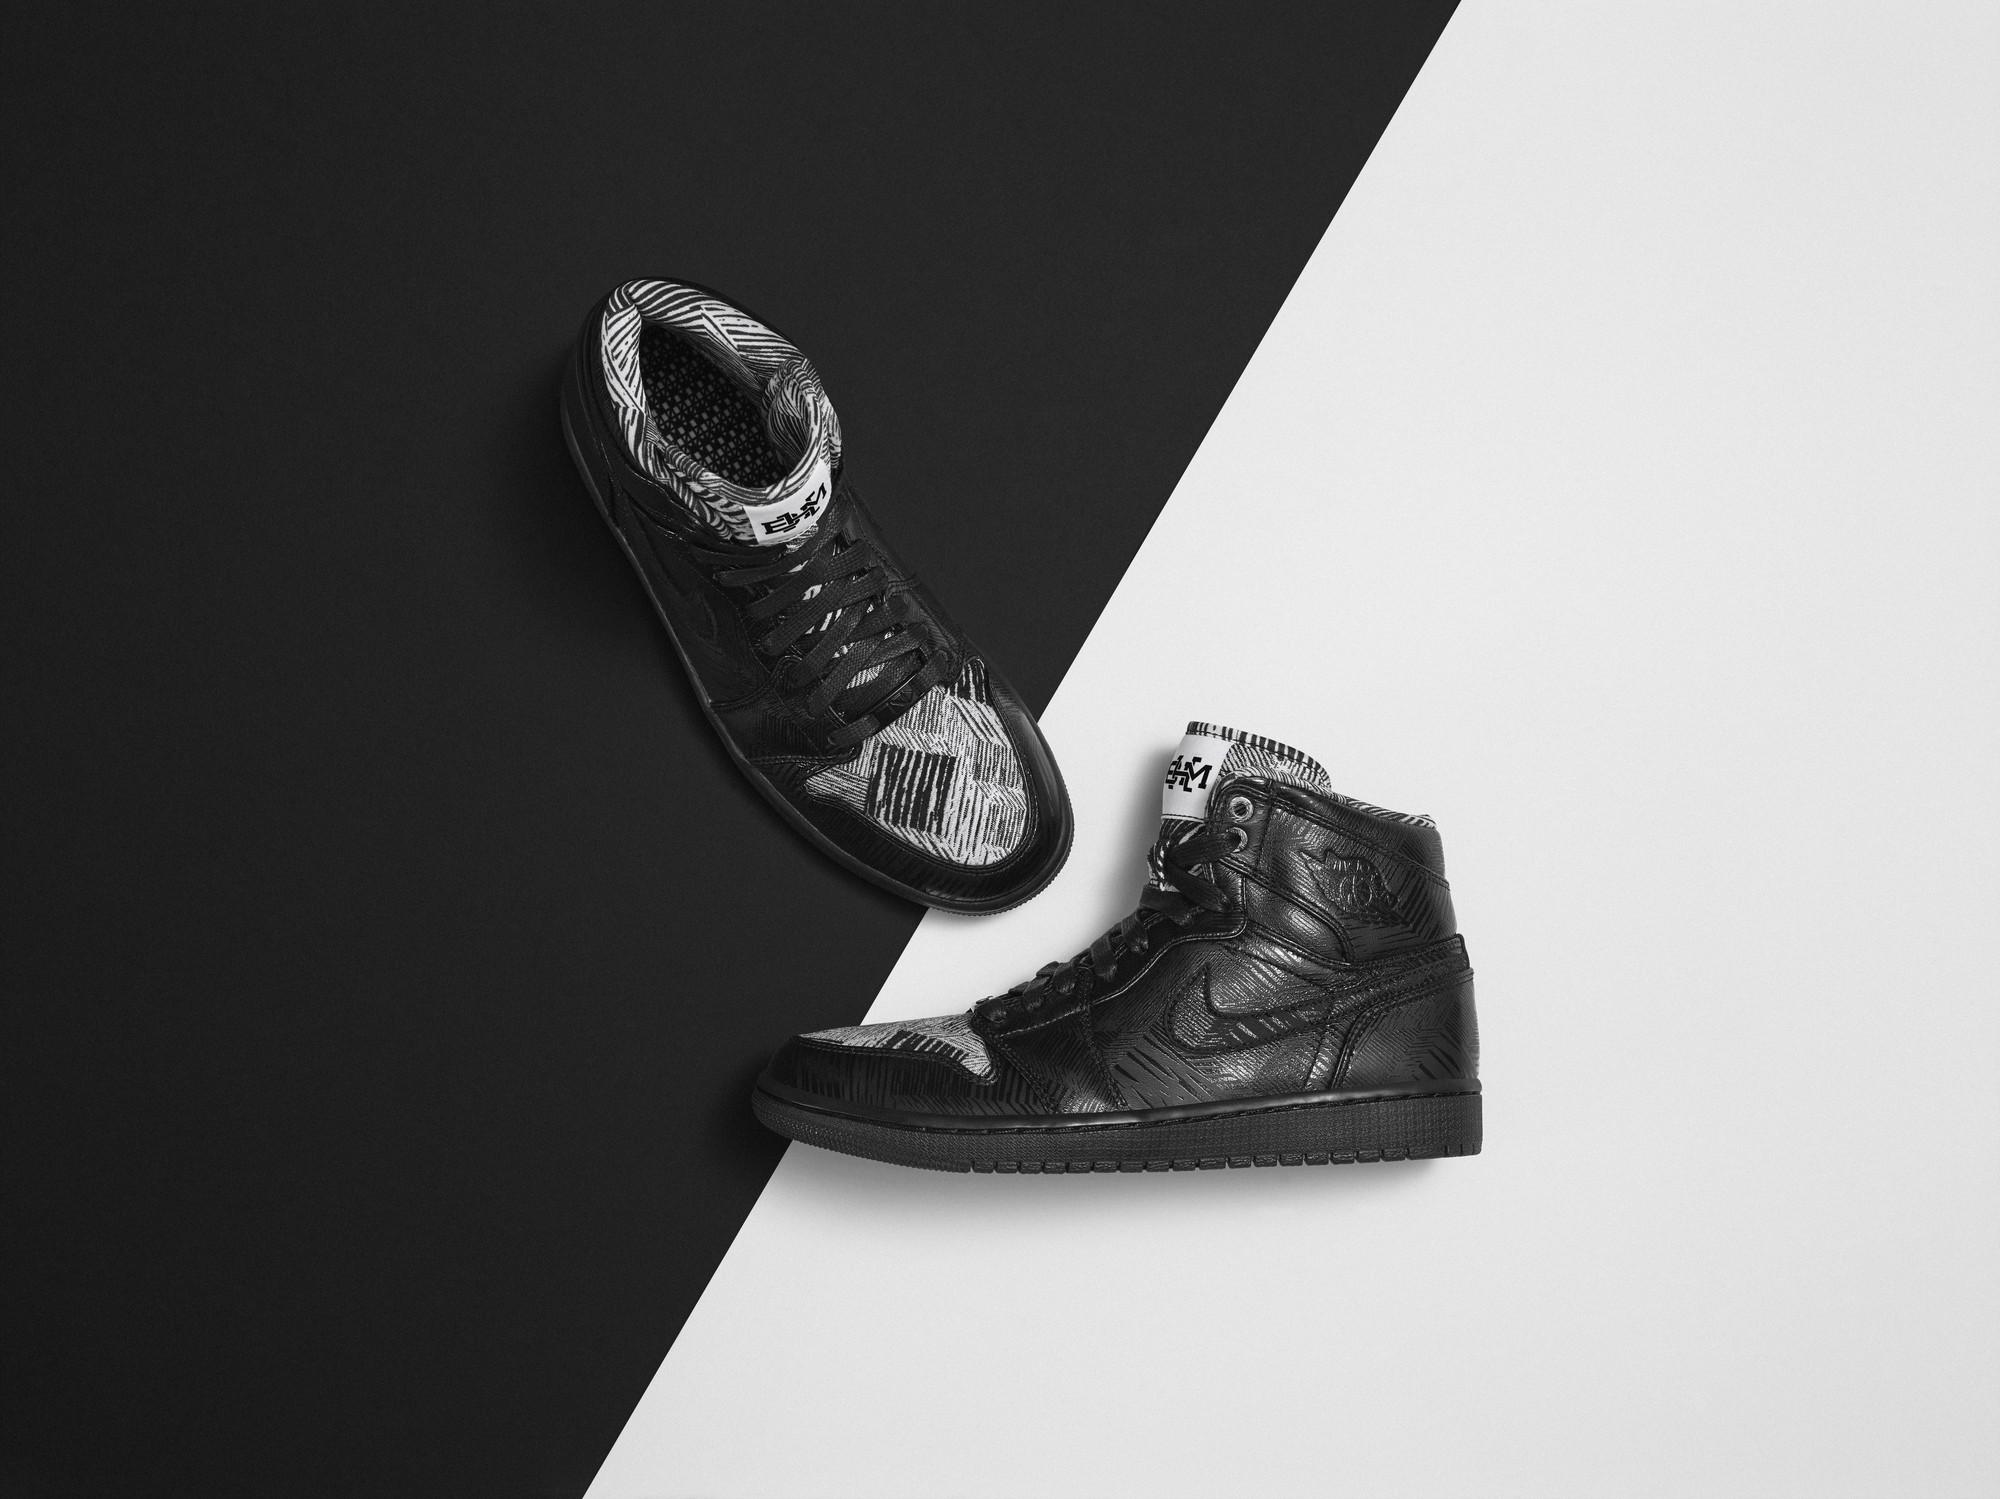 Air Jordan 1 Bhm 2015 Foot